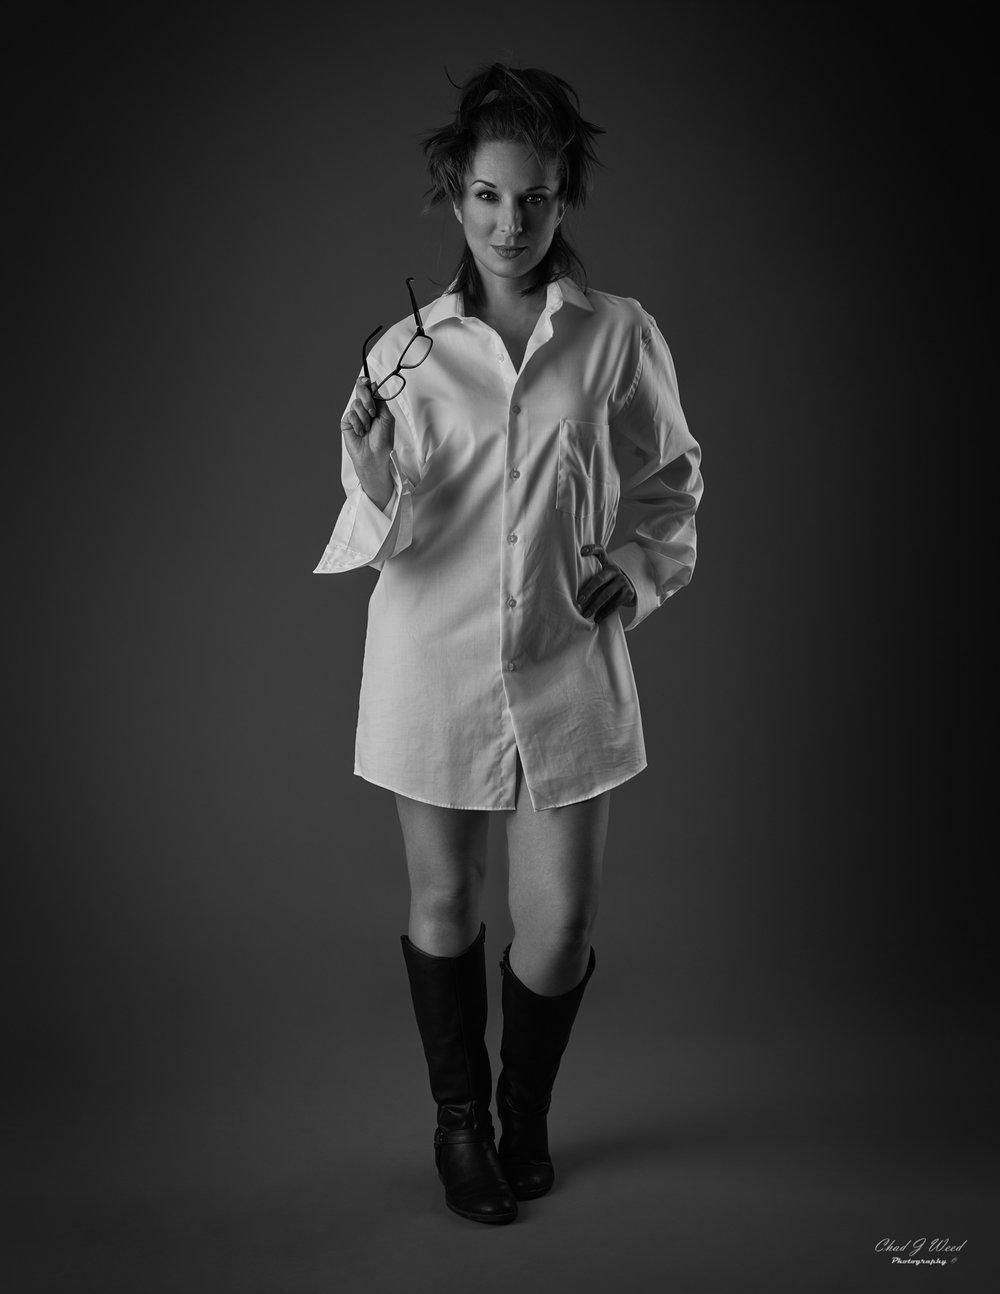 Kika NY Actress by Arizona Fashion Portrait Photographer Chad Weed